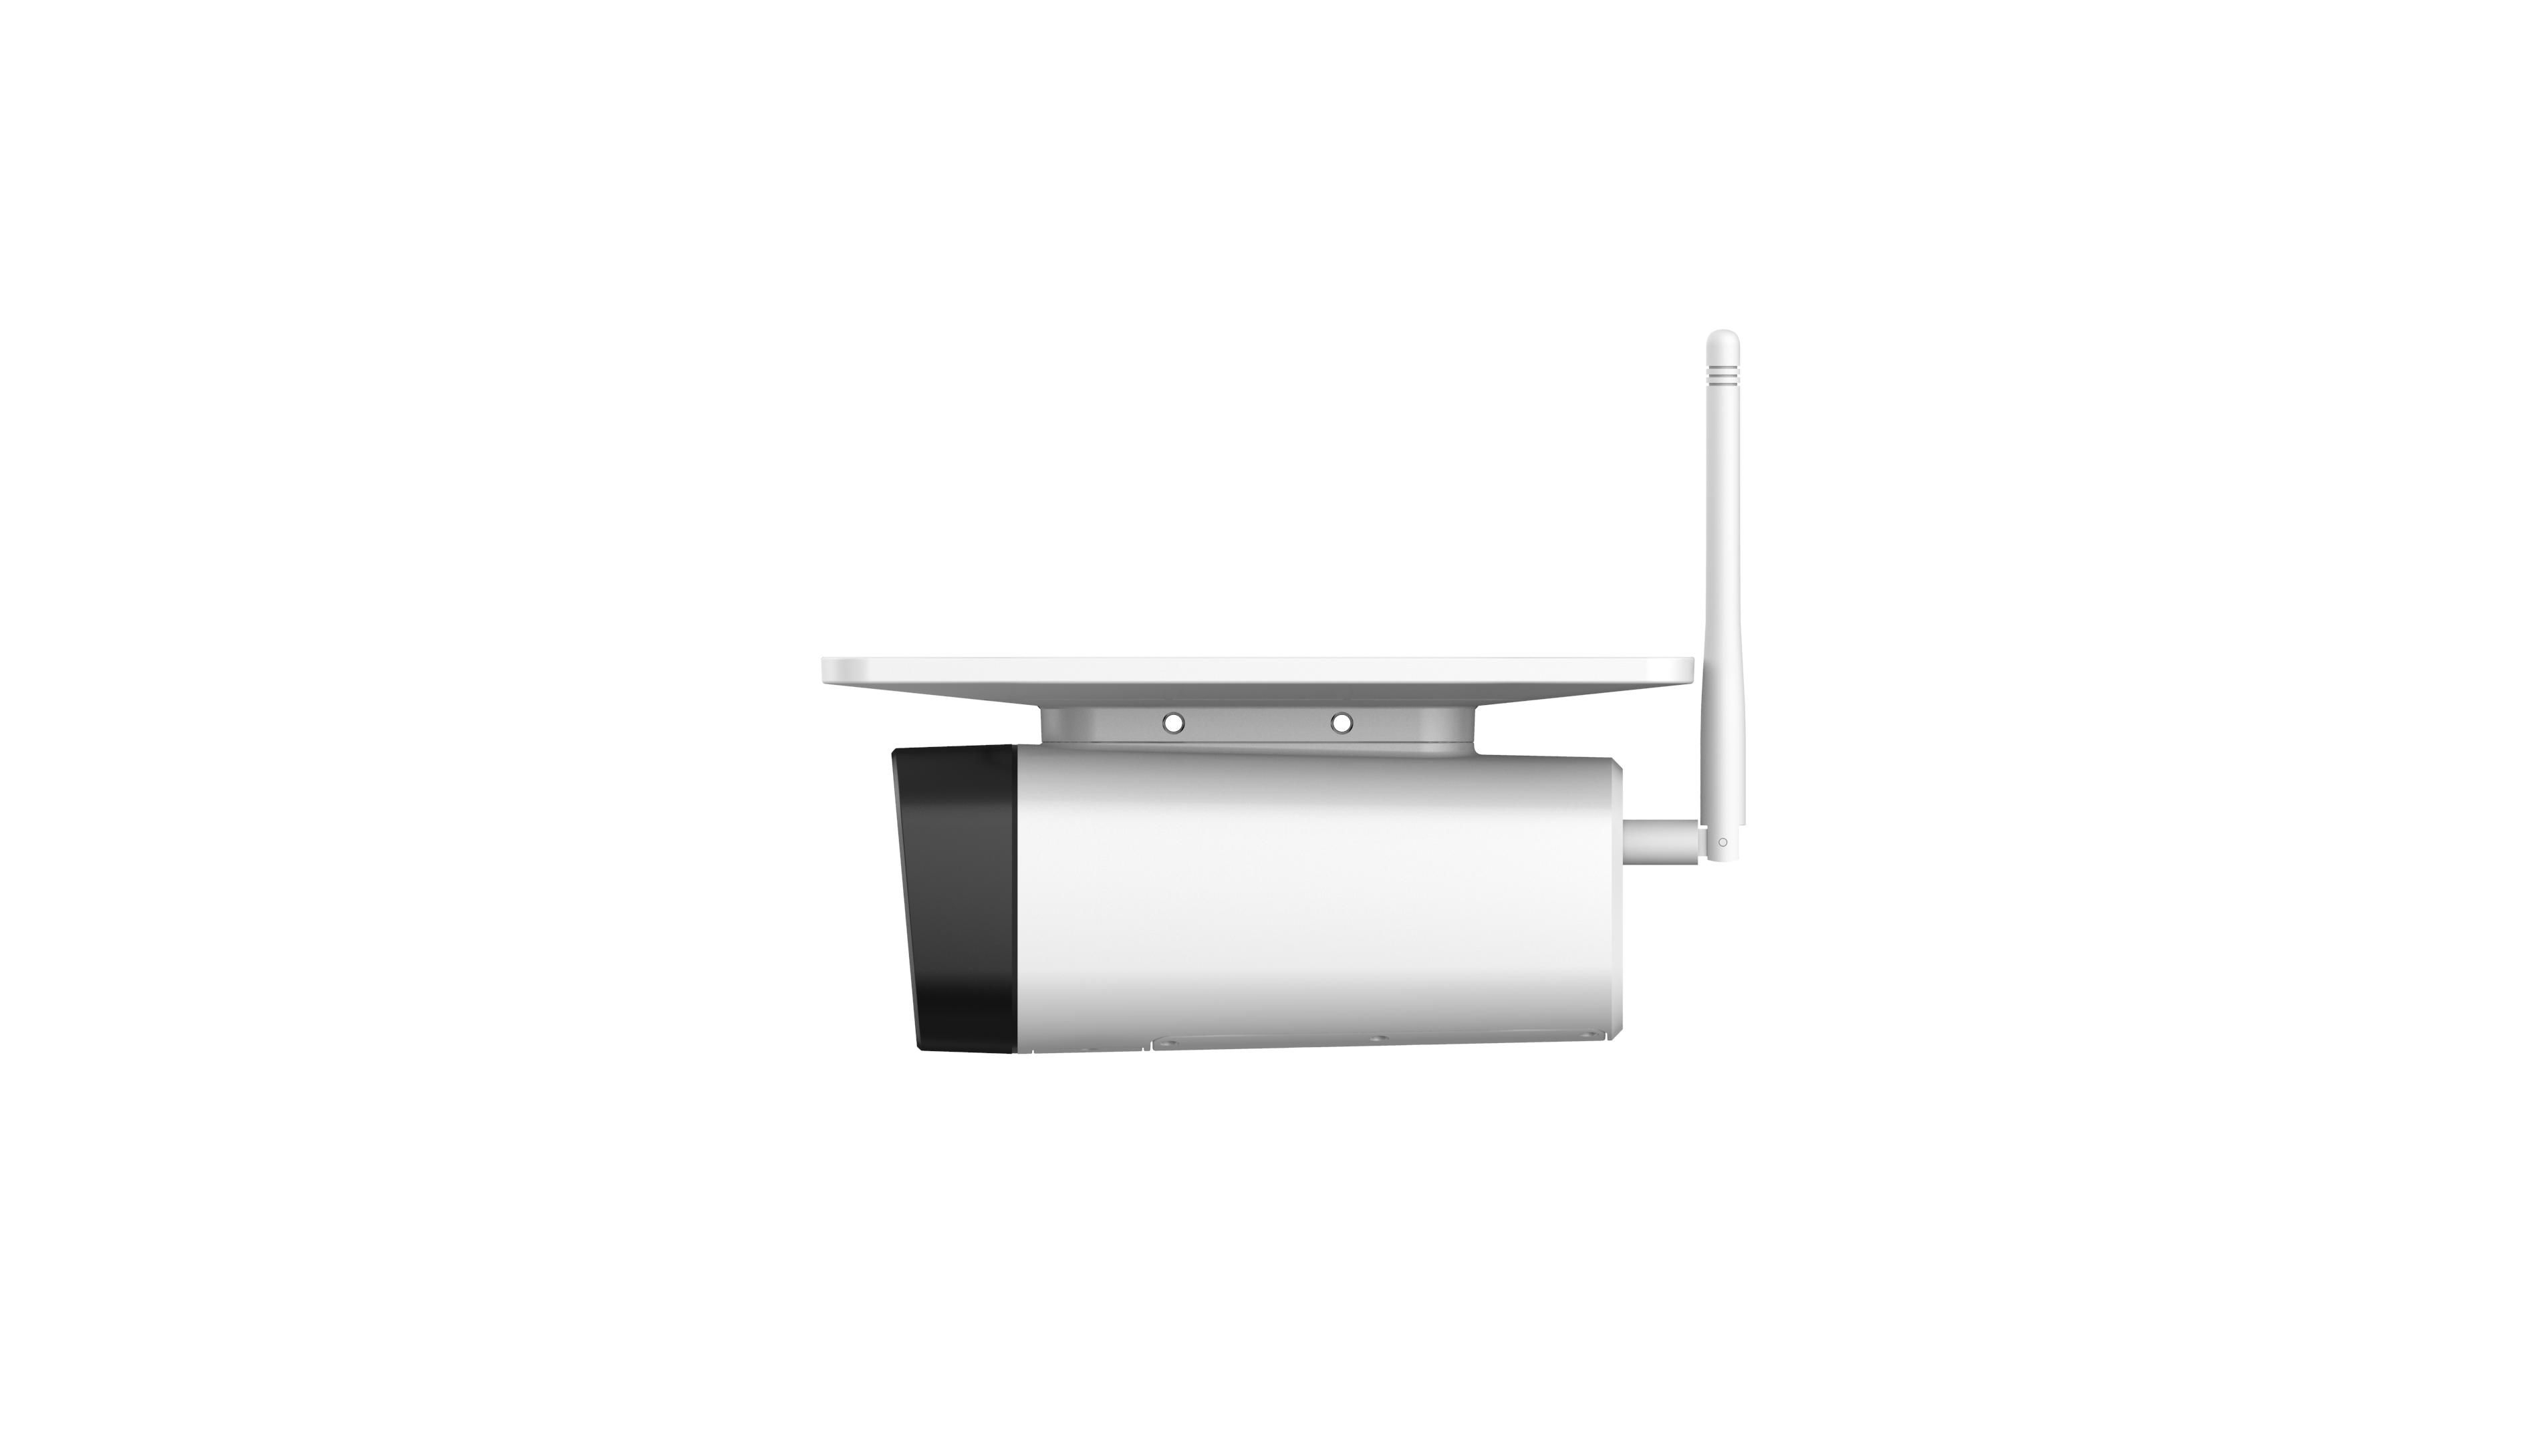 Solar Powered  4G CCTV Security Camera